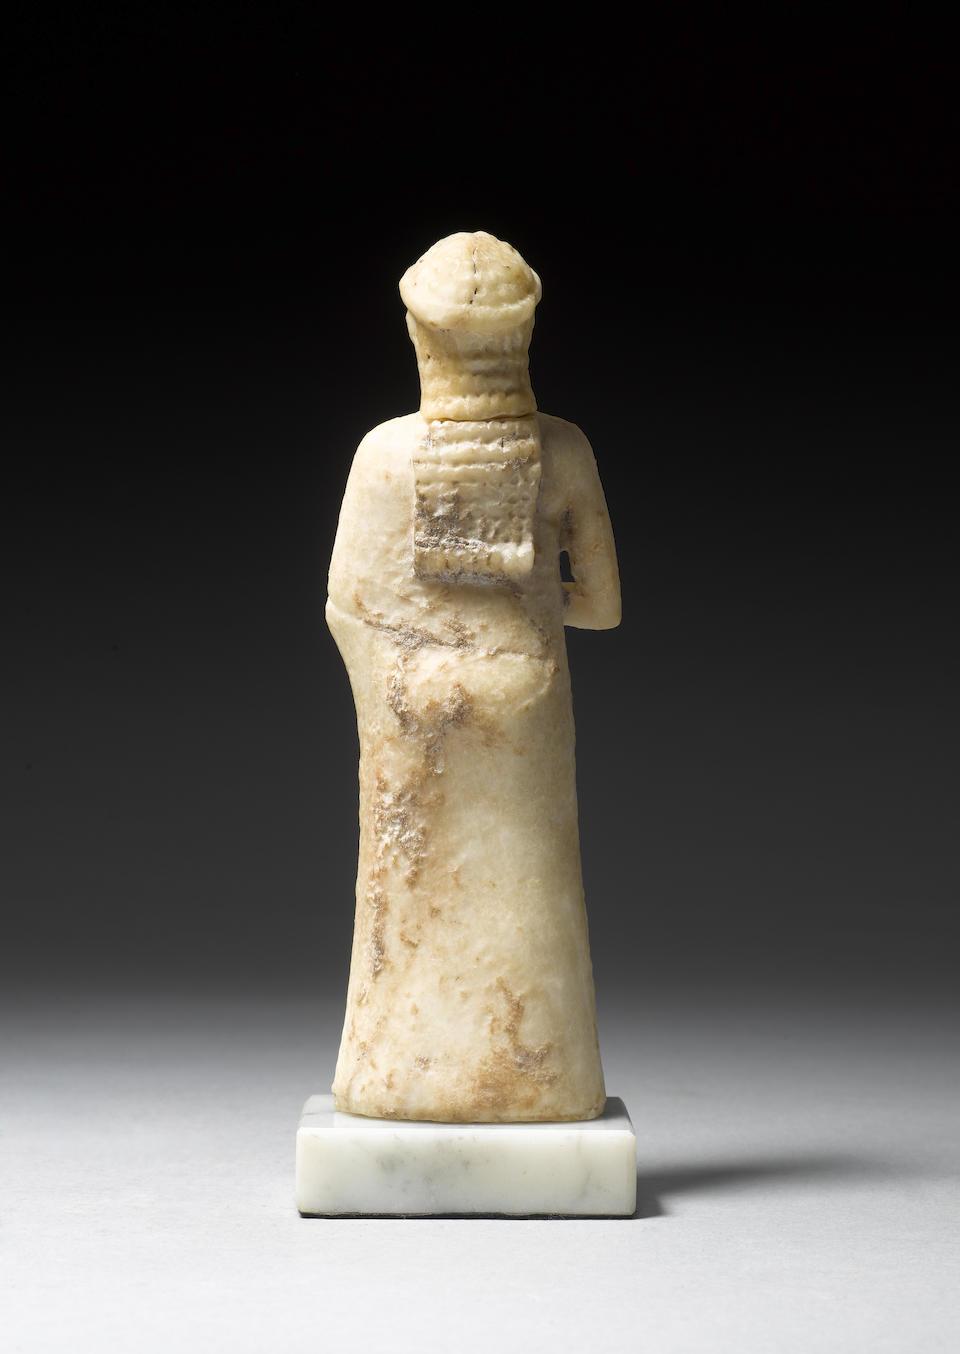 A Mesopotamian limestone female figure